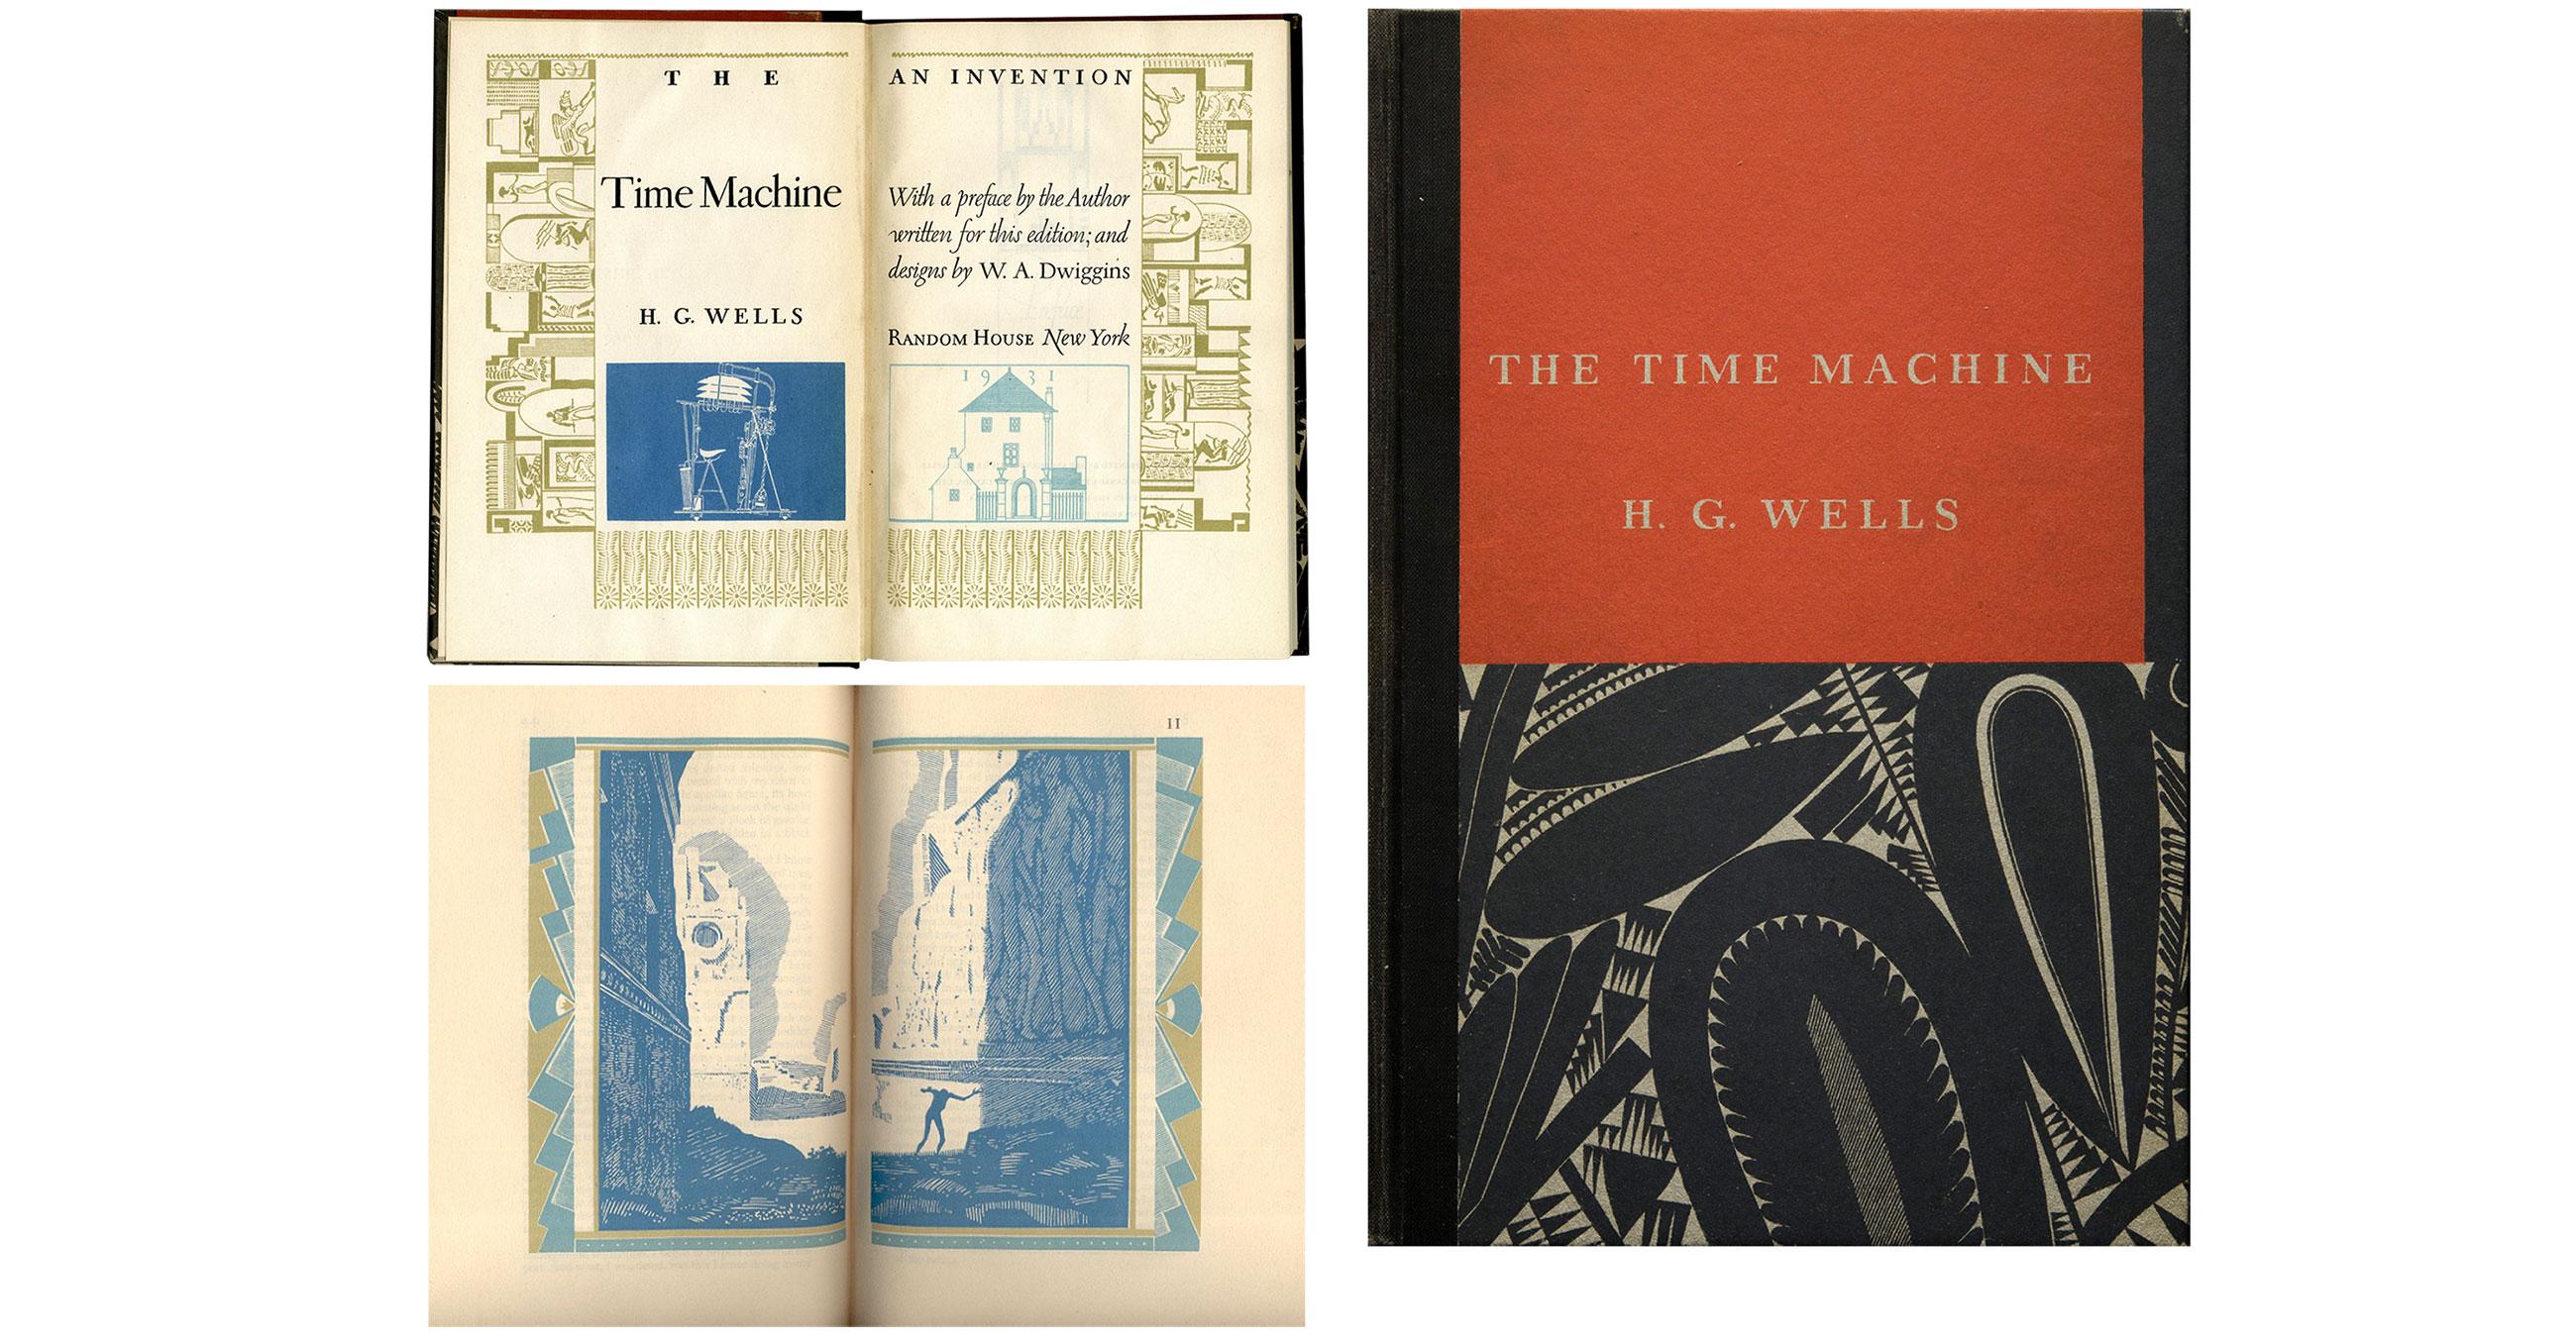 William-Addison-Dwiggins-time-machine